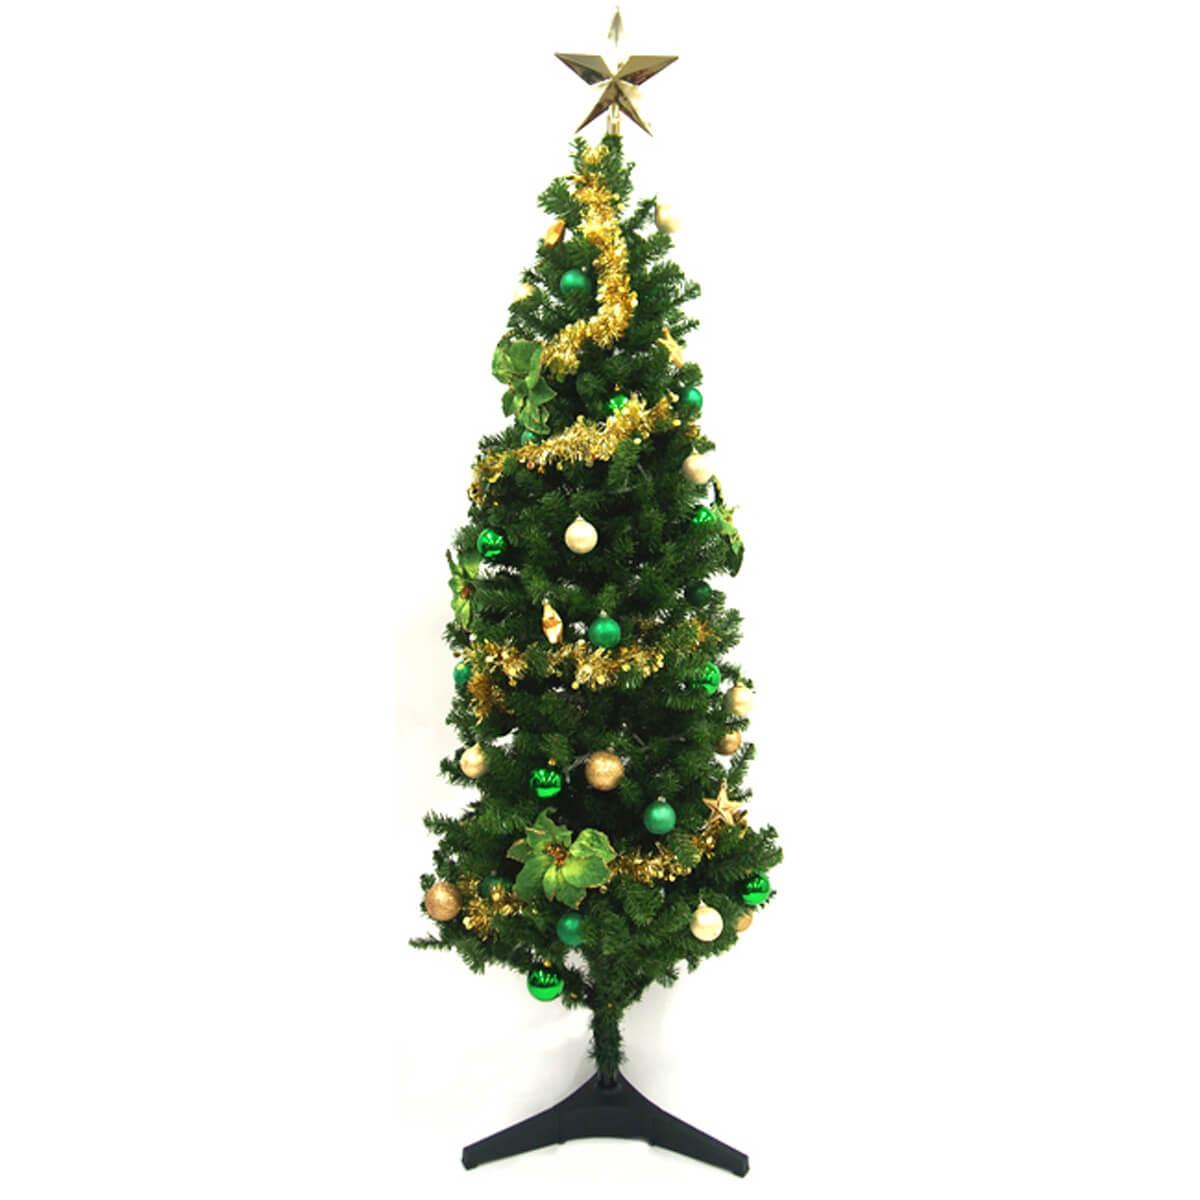 【PCH061 クリスマスツリー(グリーン・ゴールド)】クリスマス装飾 クリスマスツリー デコレーション オーナメント 飾り 冬装飾 送料無料